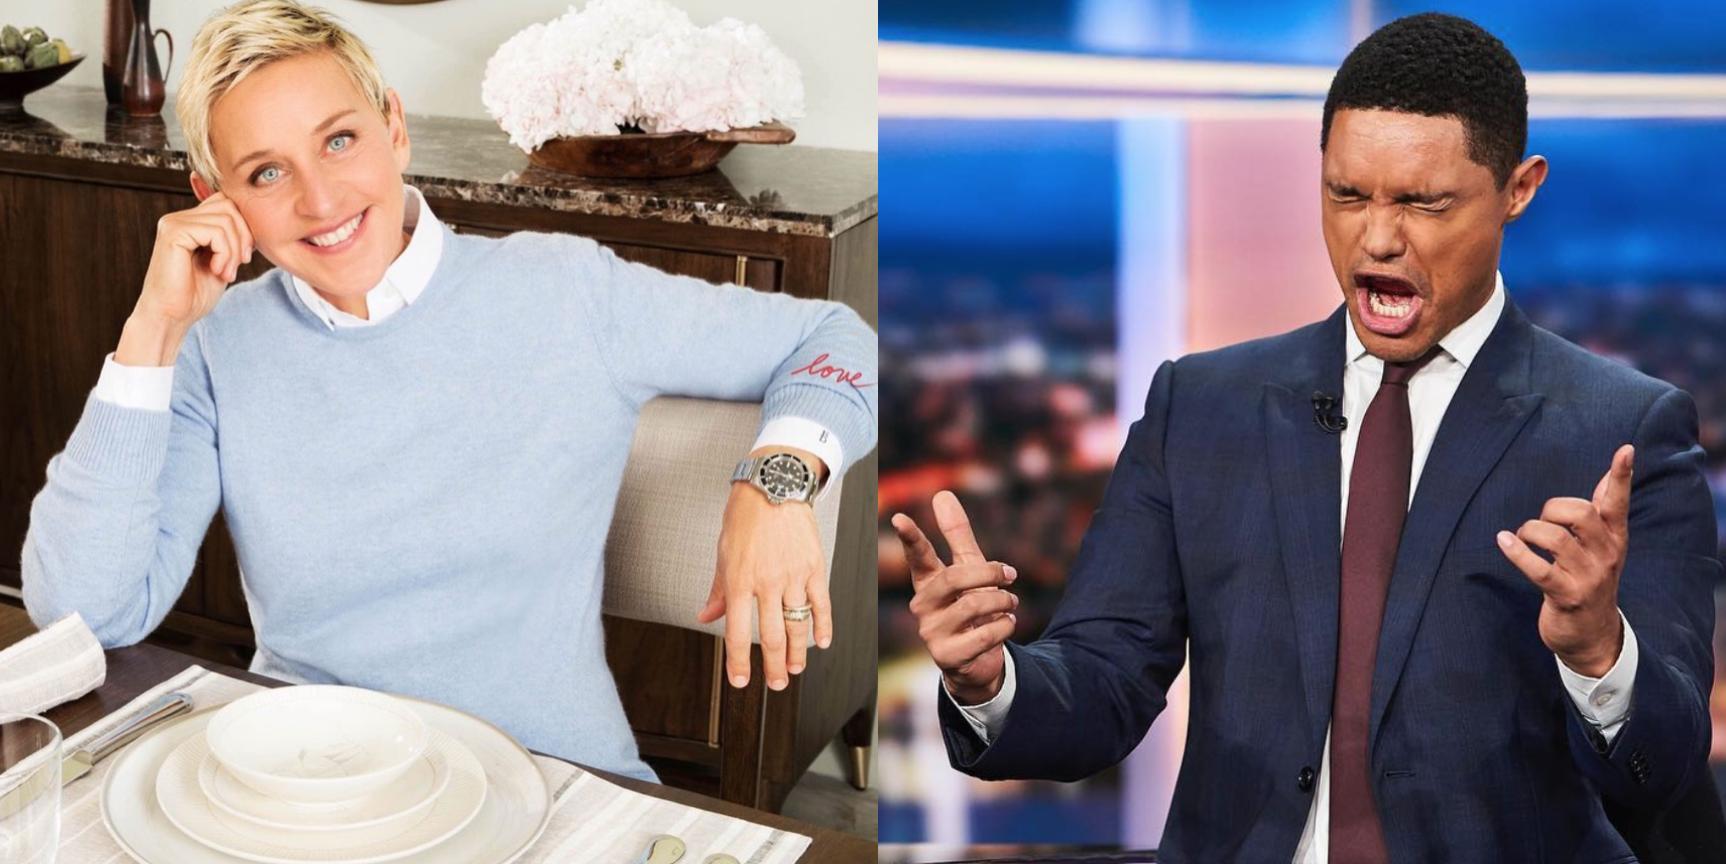 CELEBRITY WATCH DEATH MATCH: Ellen DeGeneres Vs. Trevor Noah, a toe-to-toe bout inc. Rolex, AP and Patek